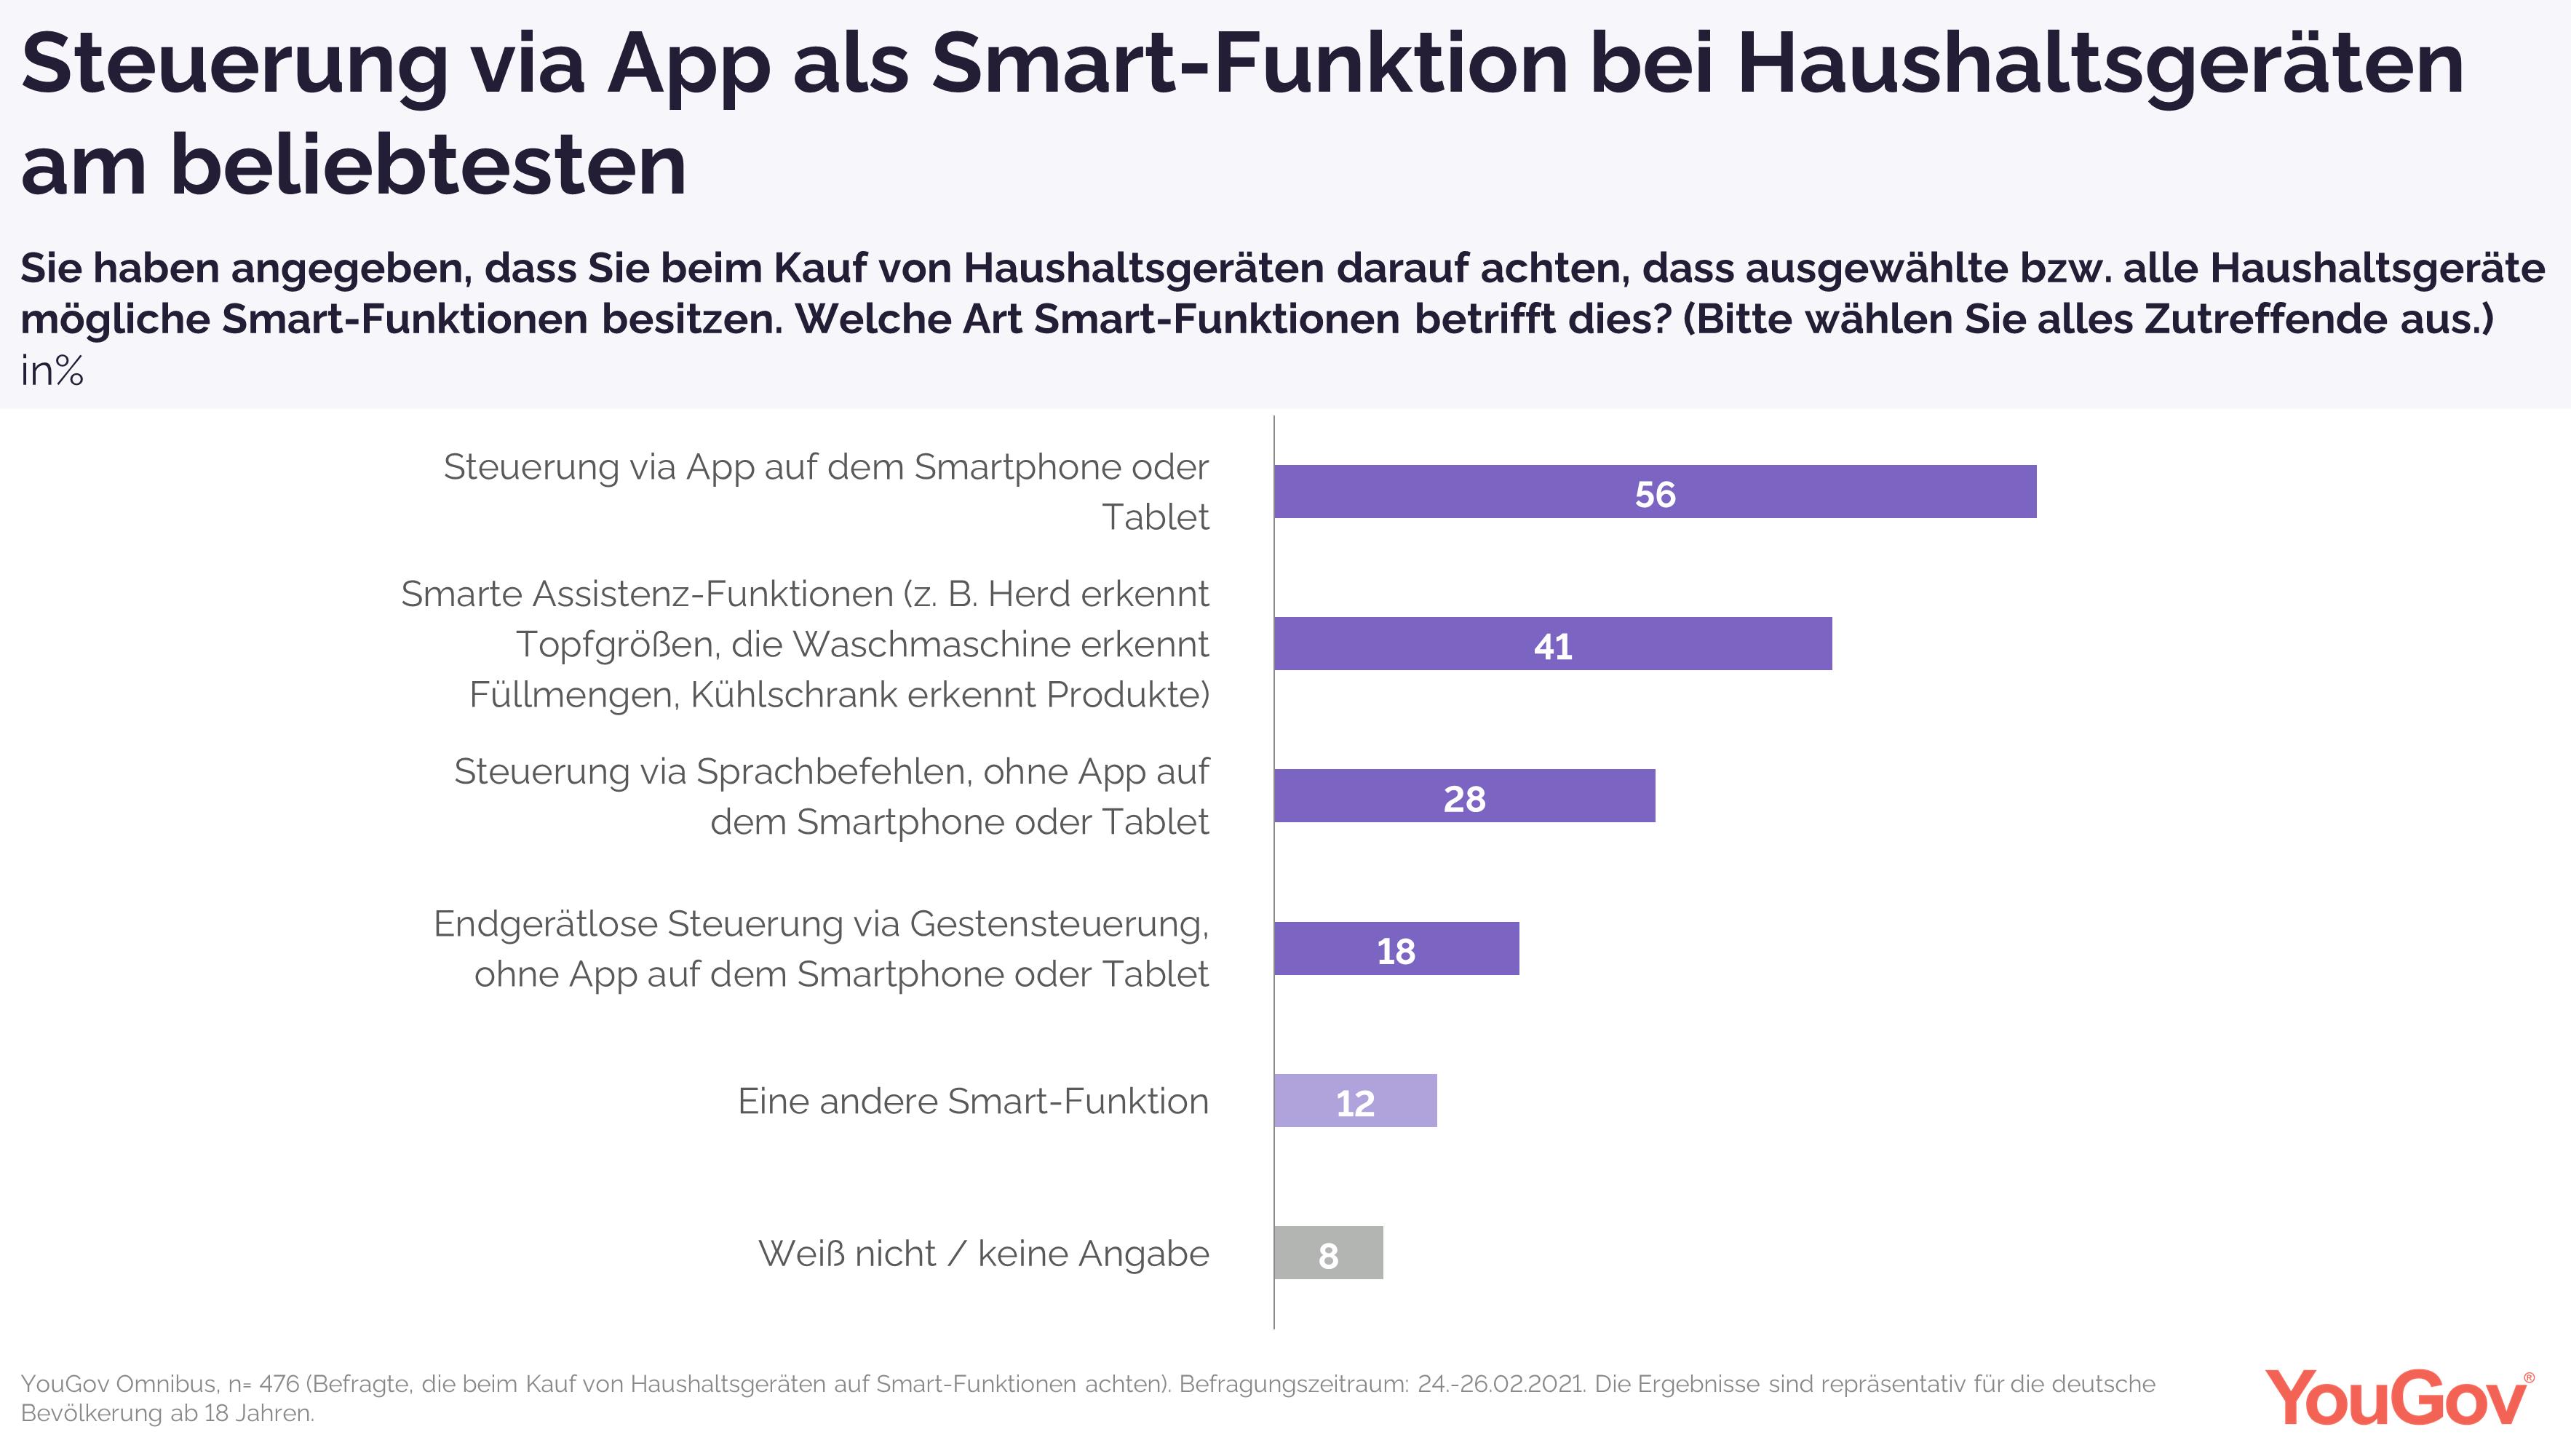 Steuerung via App als Smart-Funktion bei Haushaltsgeräten am beliebtesten